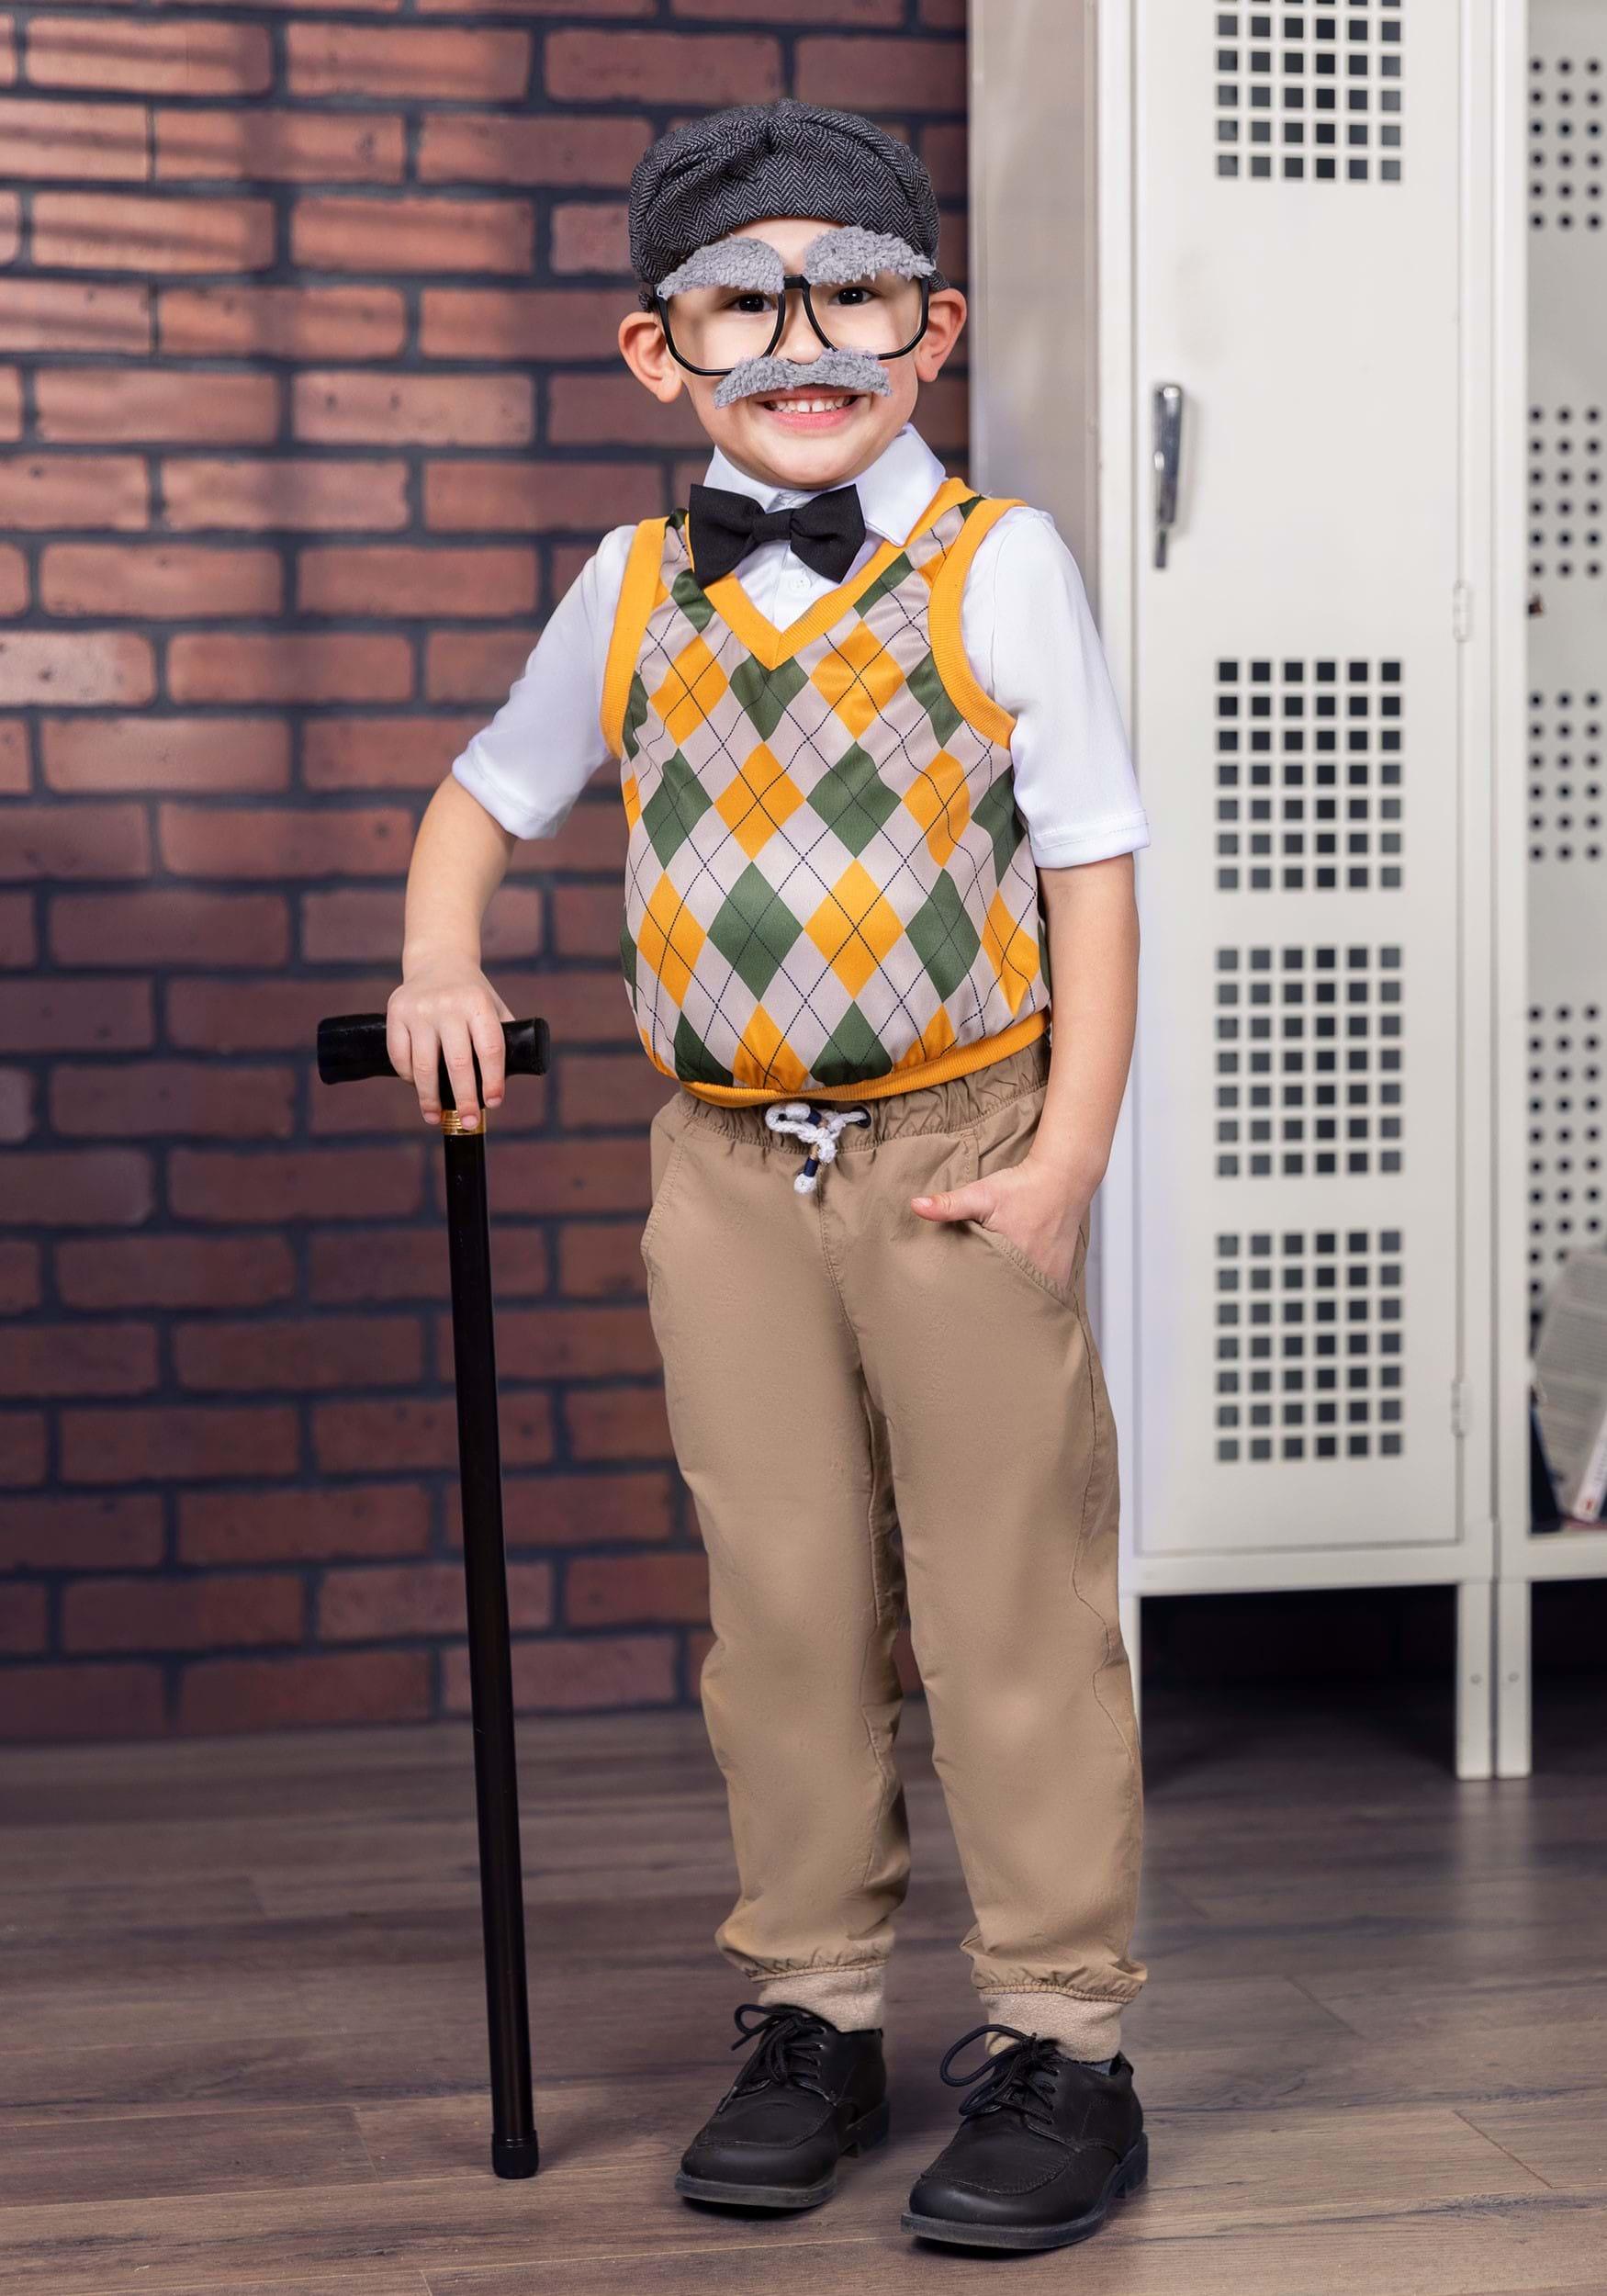 ¿INTERNET democratizó la música? - Página 2 Toddlers-old-man-costume